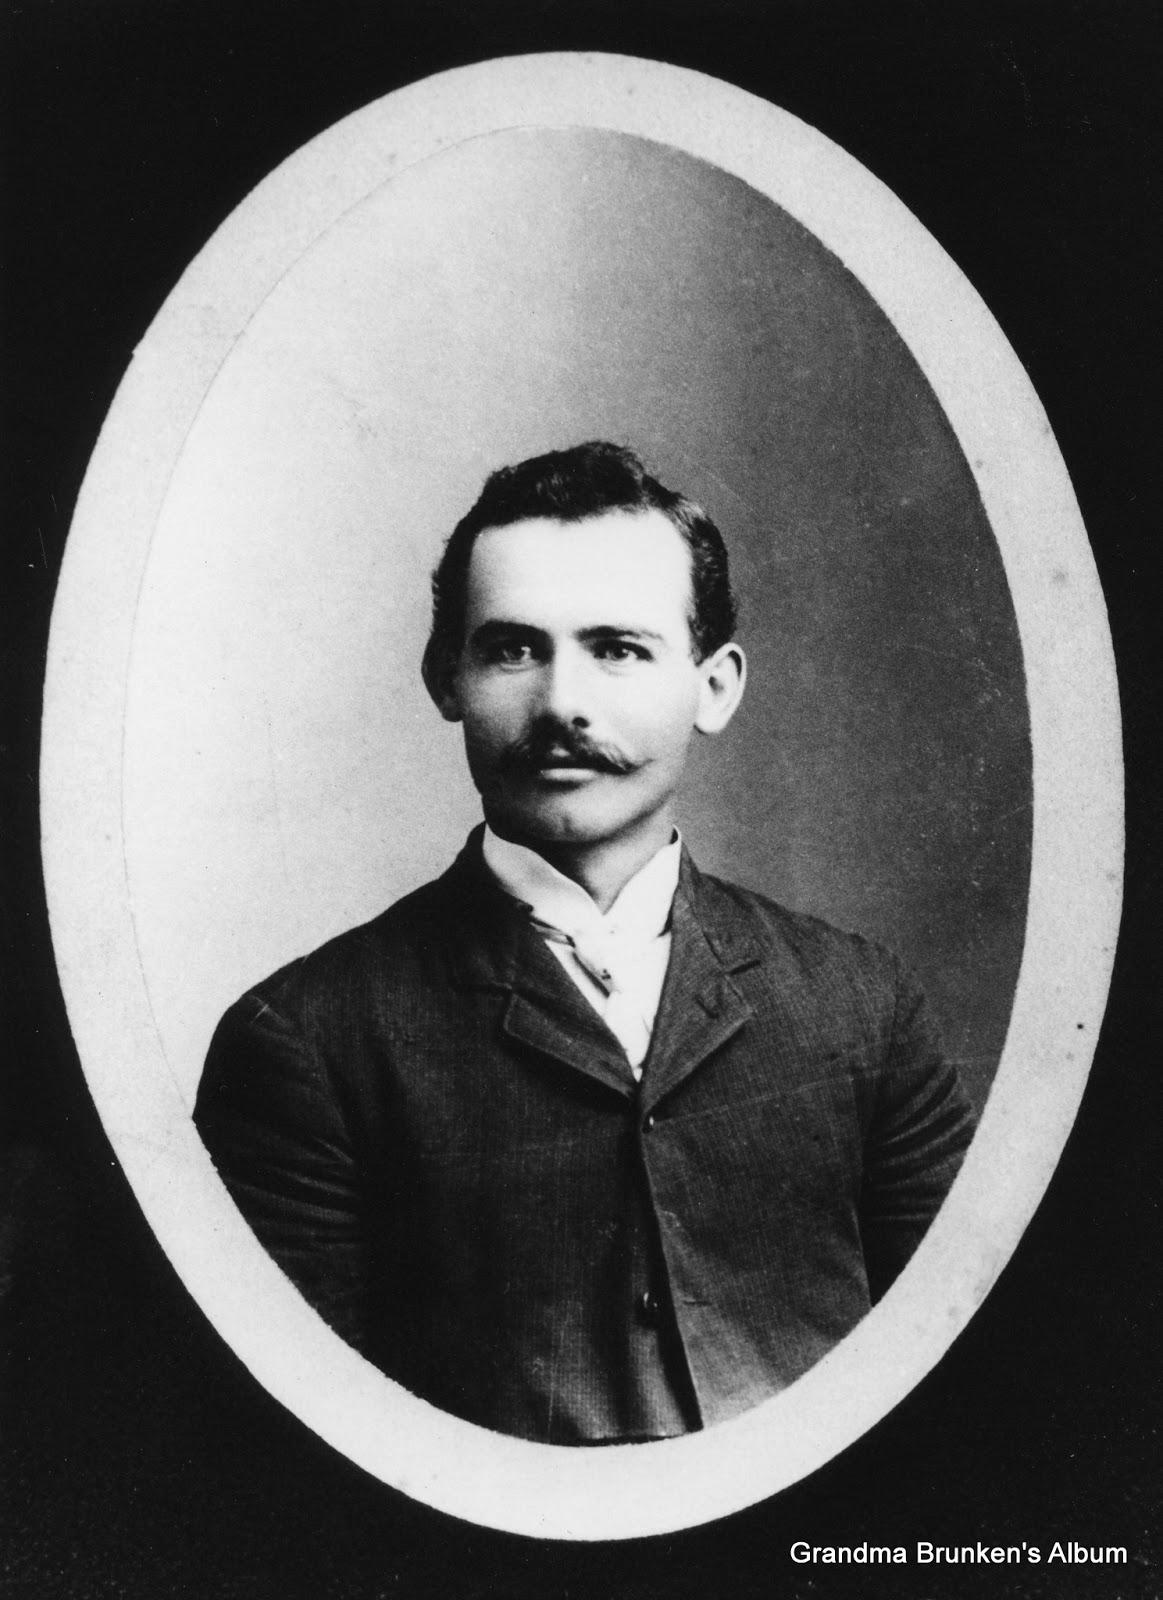 William Leopold Brunken